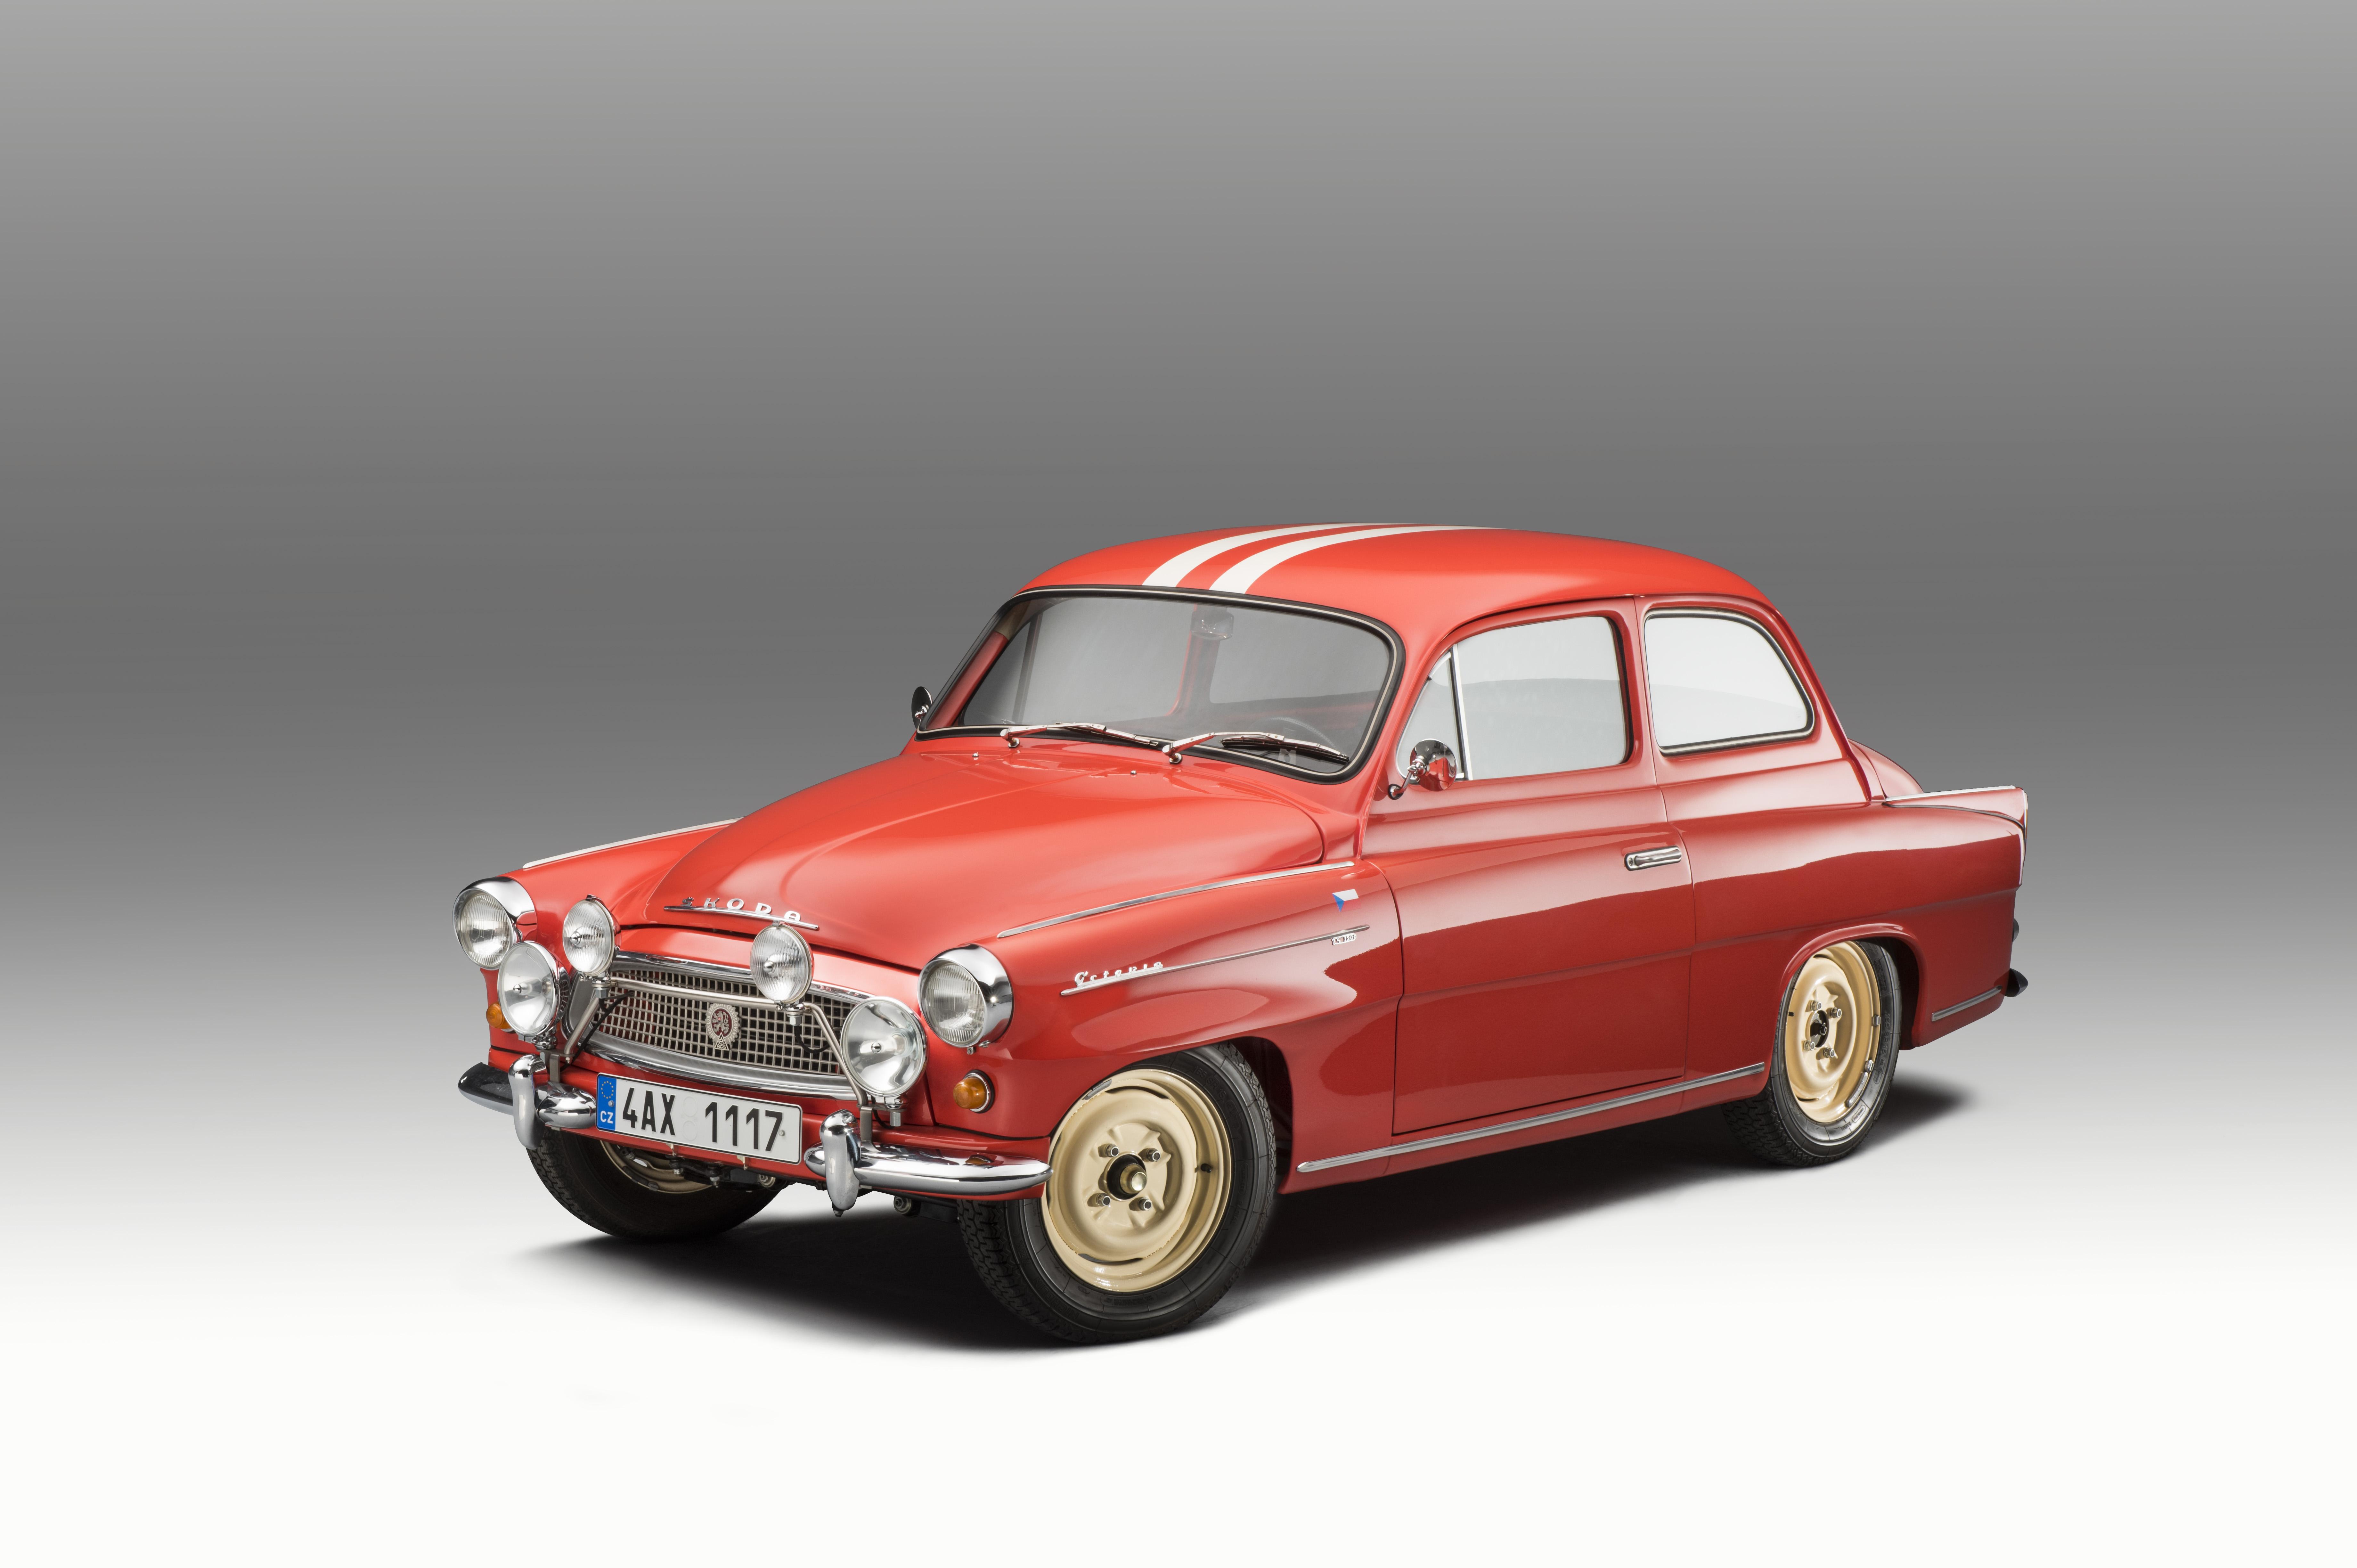 SKODA OCTAVIA TOURING SPORT (1960): Successful return to international rally courses - Image 6